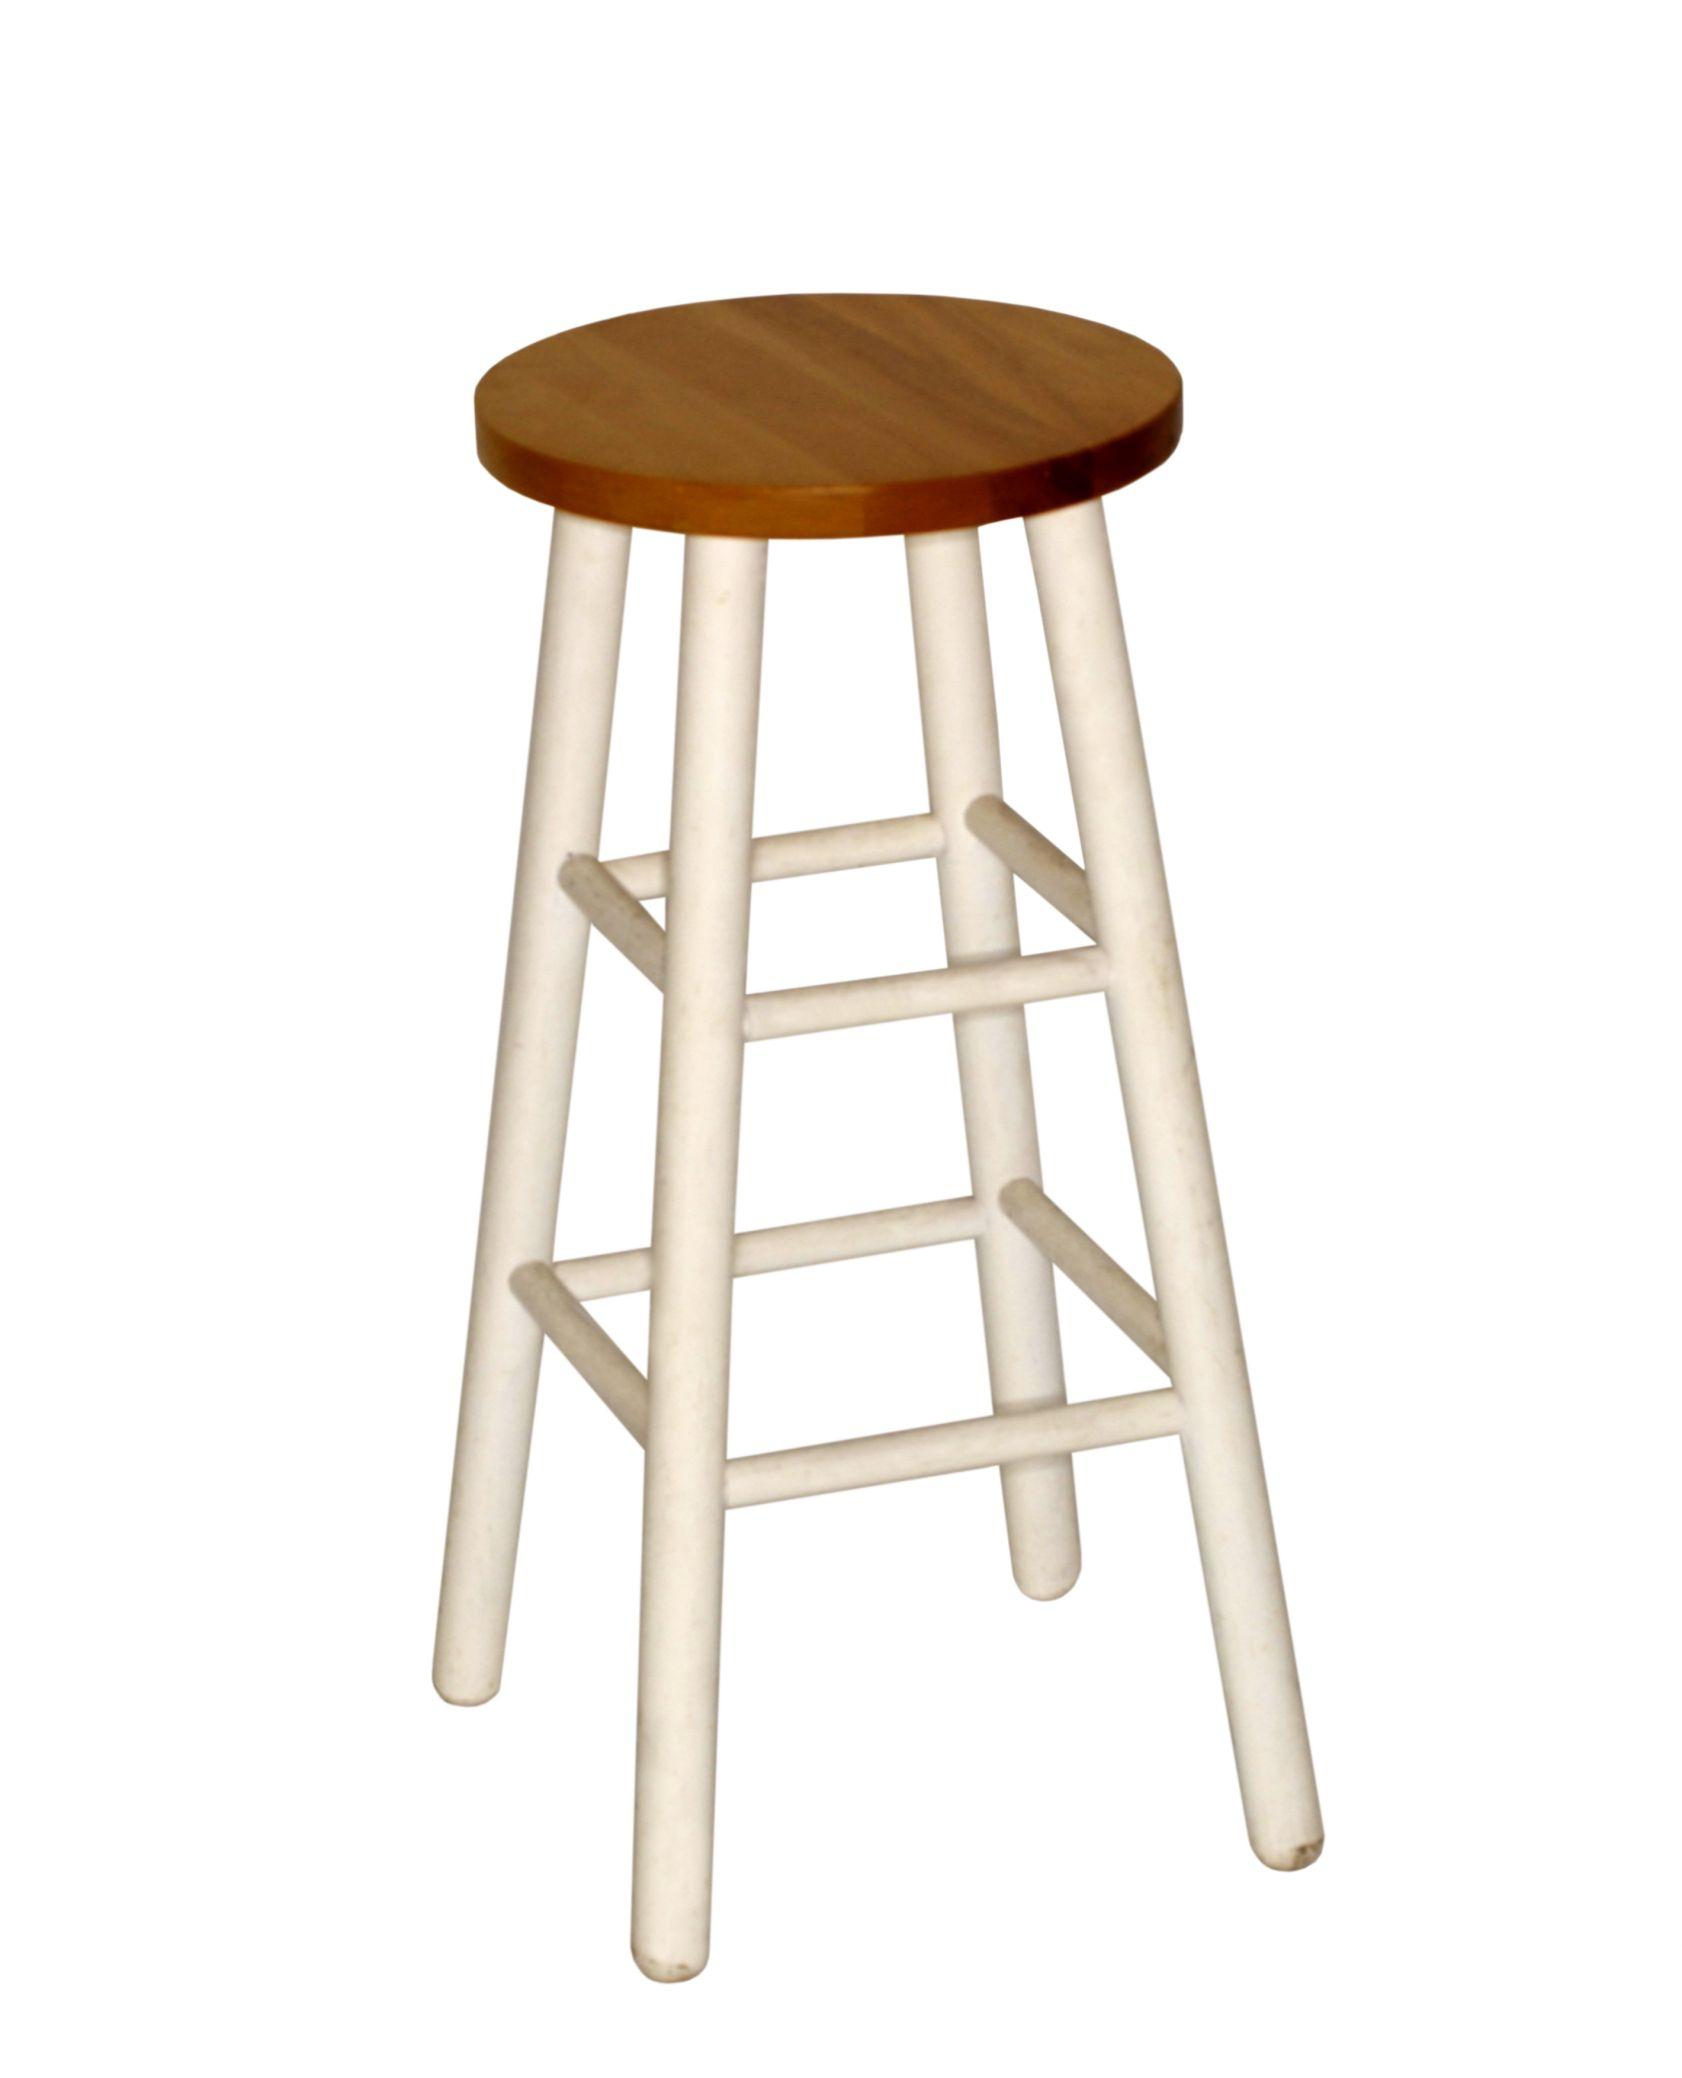 Pleasing How To Make Backless Bar Stool Cushions Bar Stool Covers Customarchery Wood Chair Design Ideas Customarcherynet